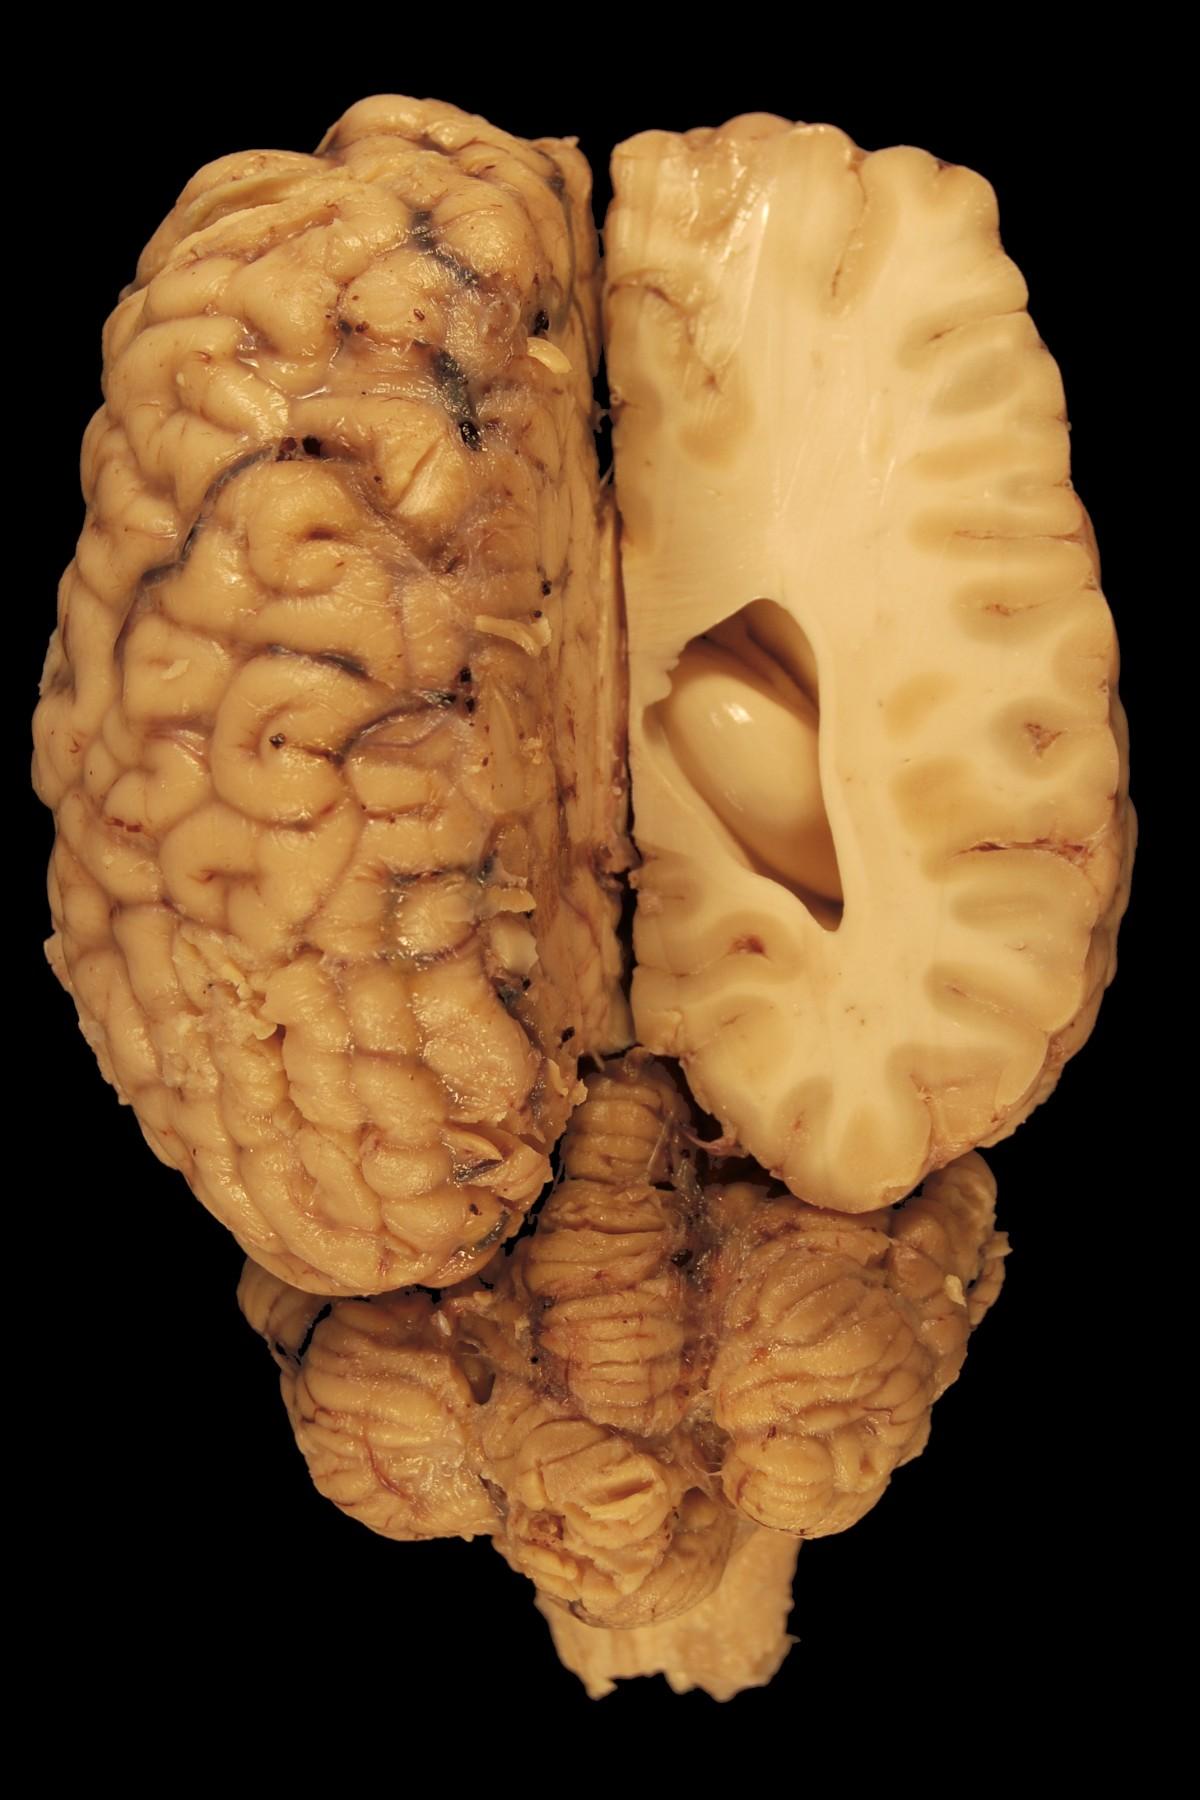 brain_anatomy_eyes_paerparat_horse_biology_dorsal_body-1126352.jpg